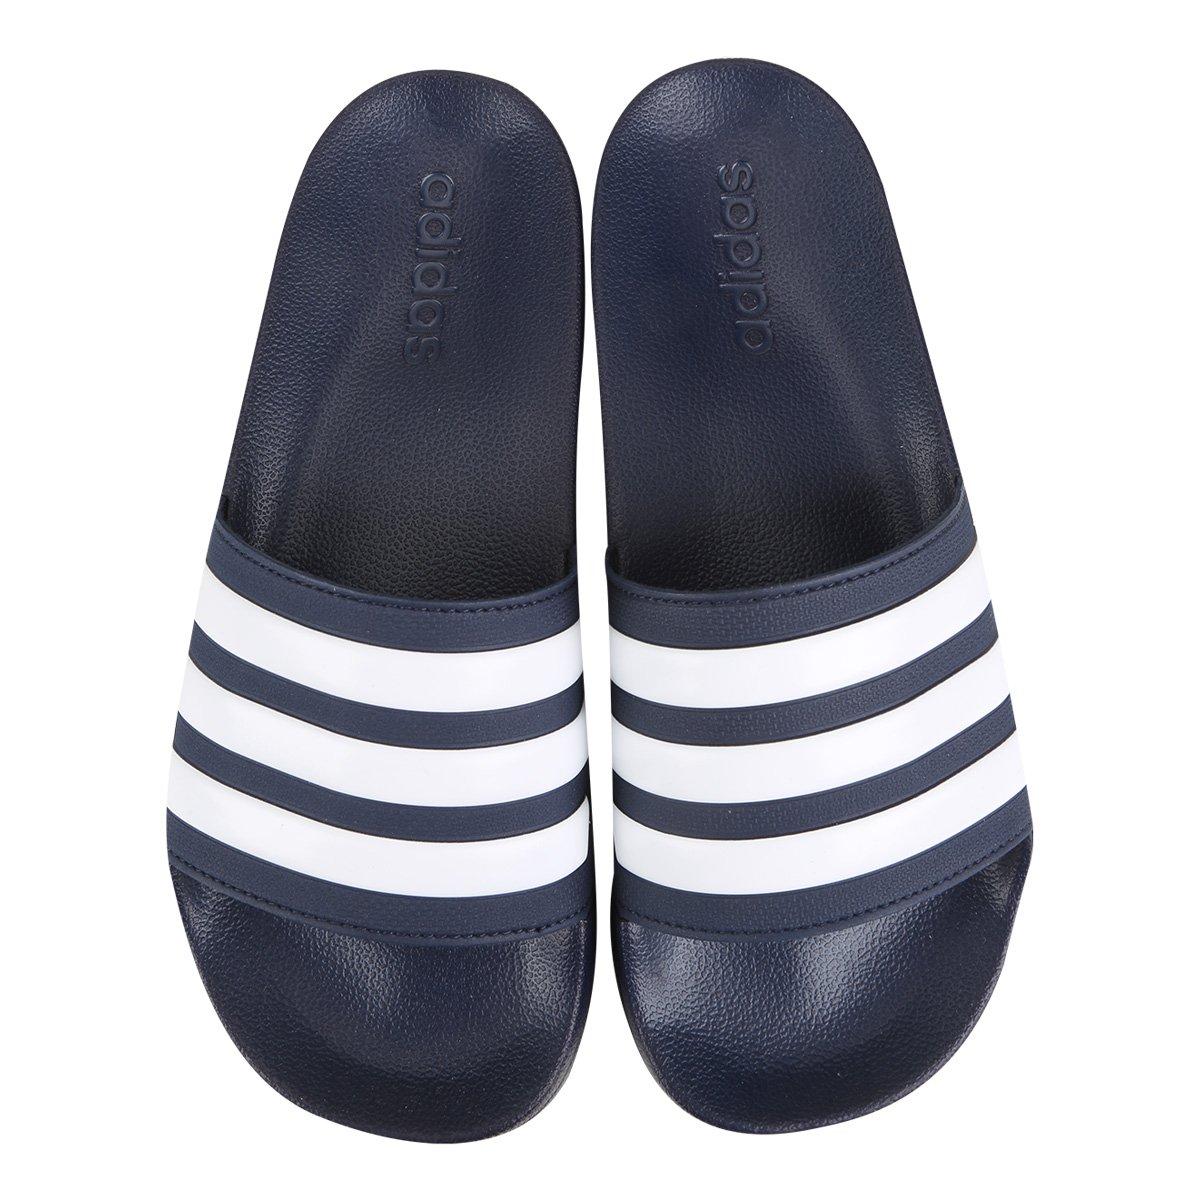 Chinelo Slide Adidas Adilette Cloudfoam Masculino - Tam: 38/39